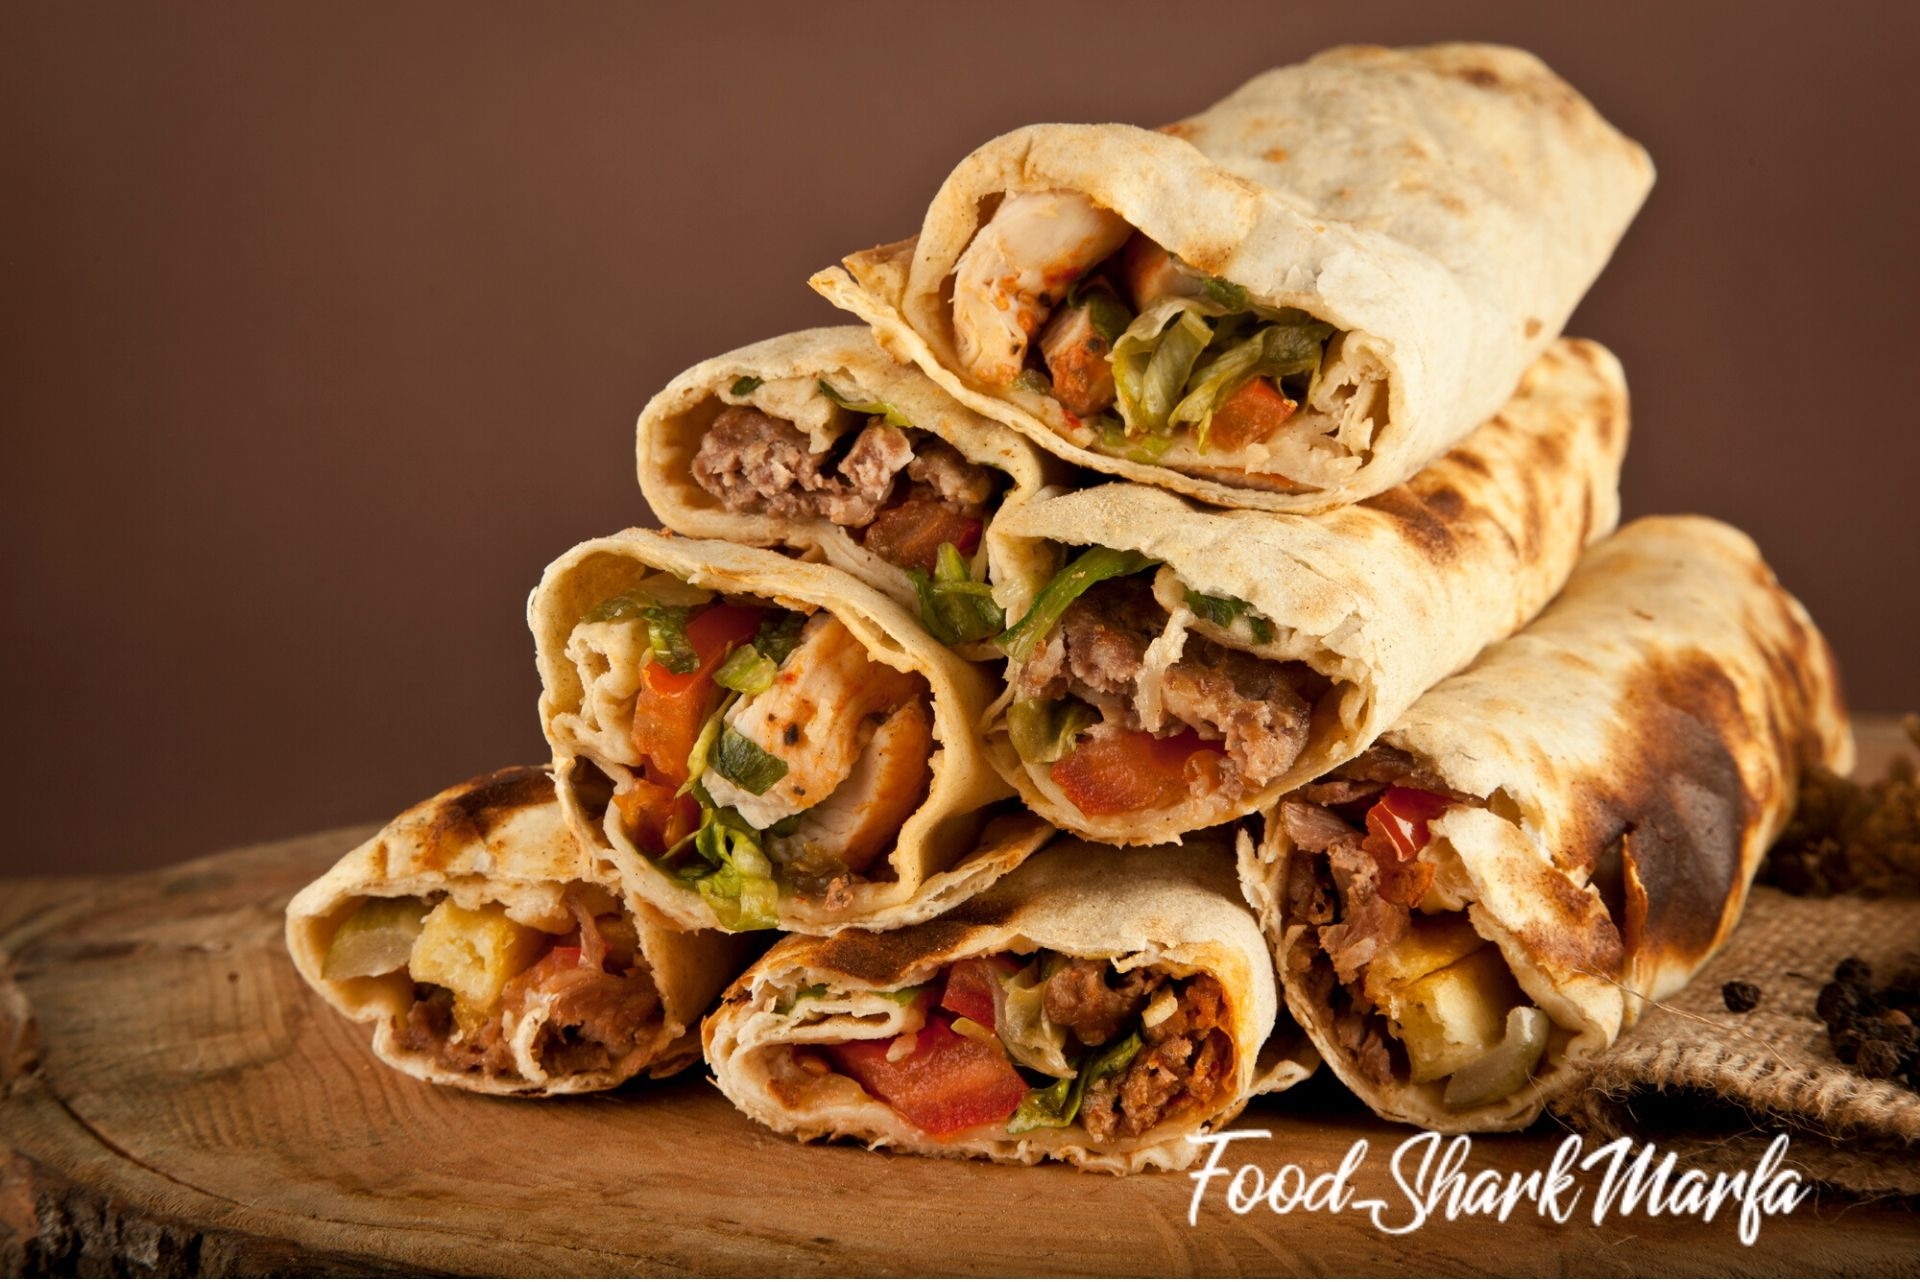 Turkish shawarma